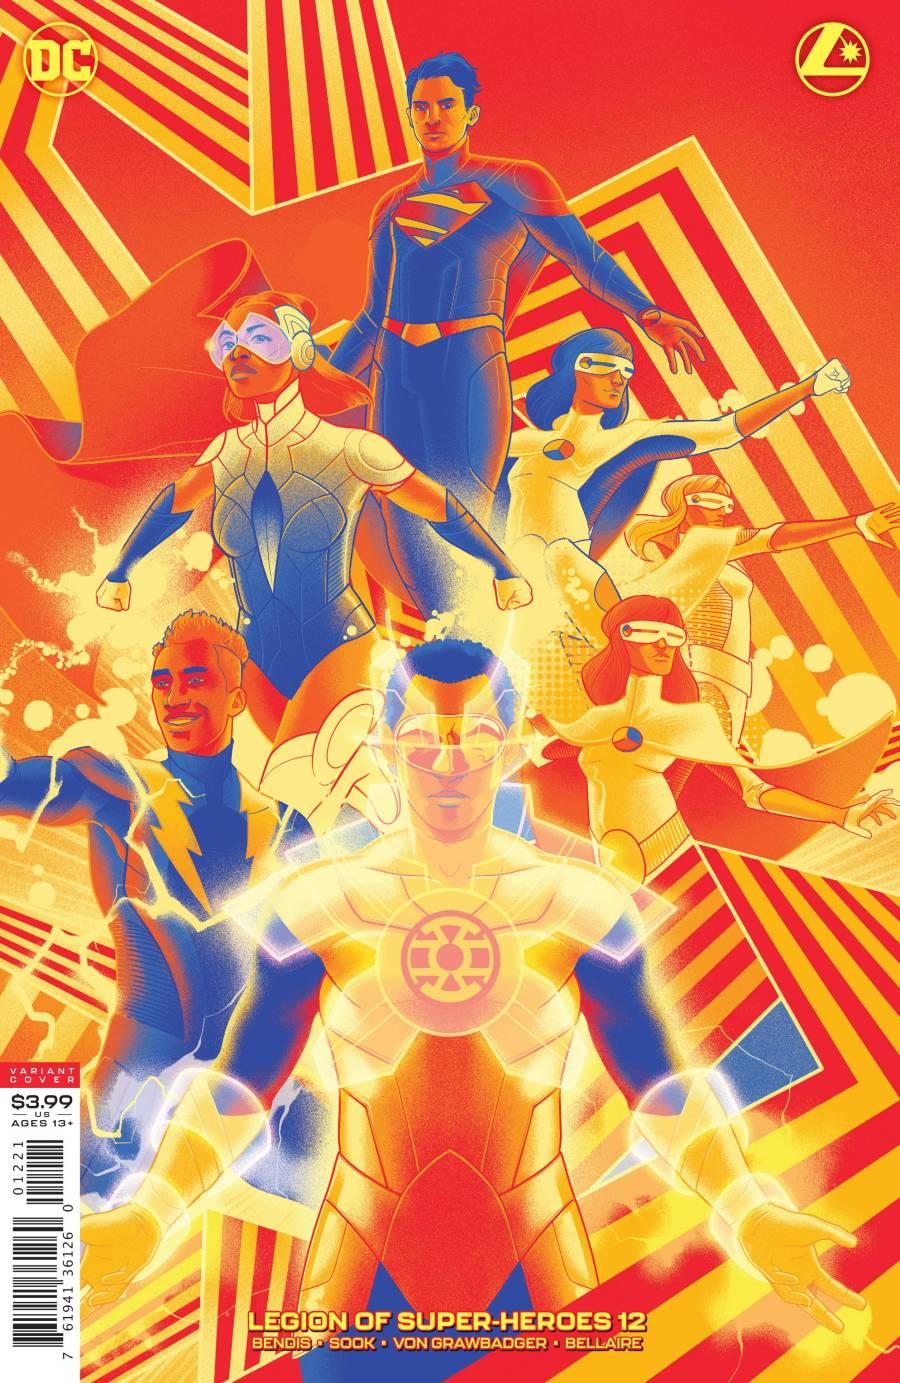 Legion Of Superheroes #12 Review - The Aspiring Kryptonian